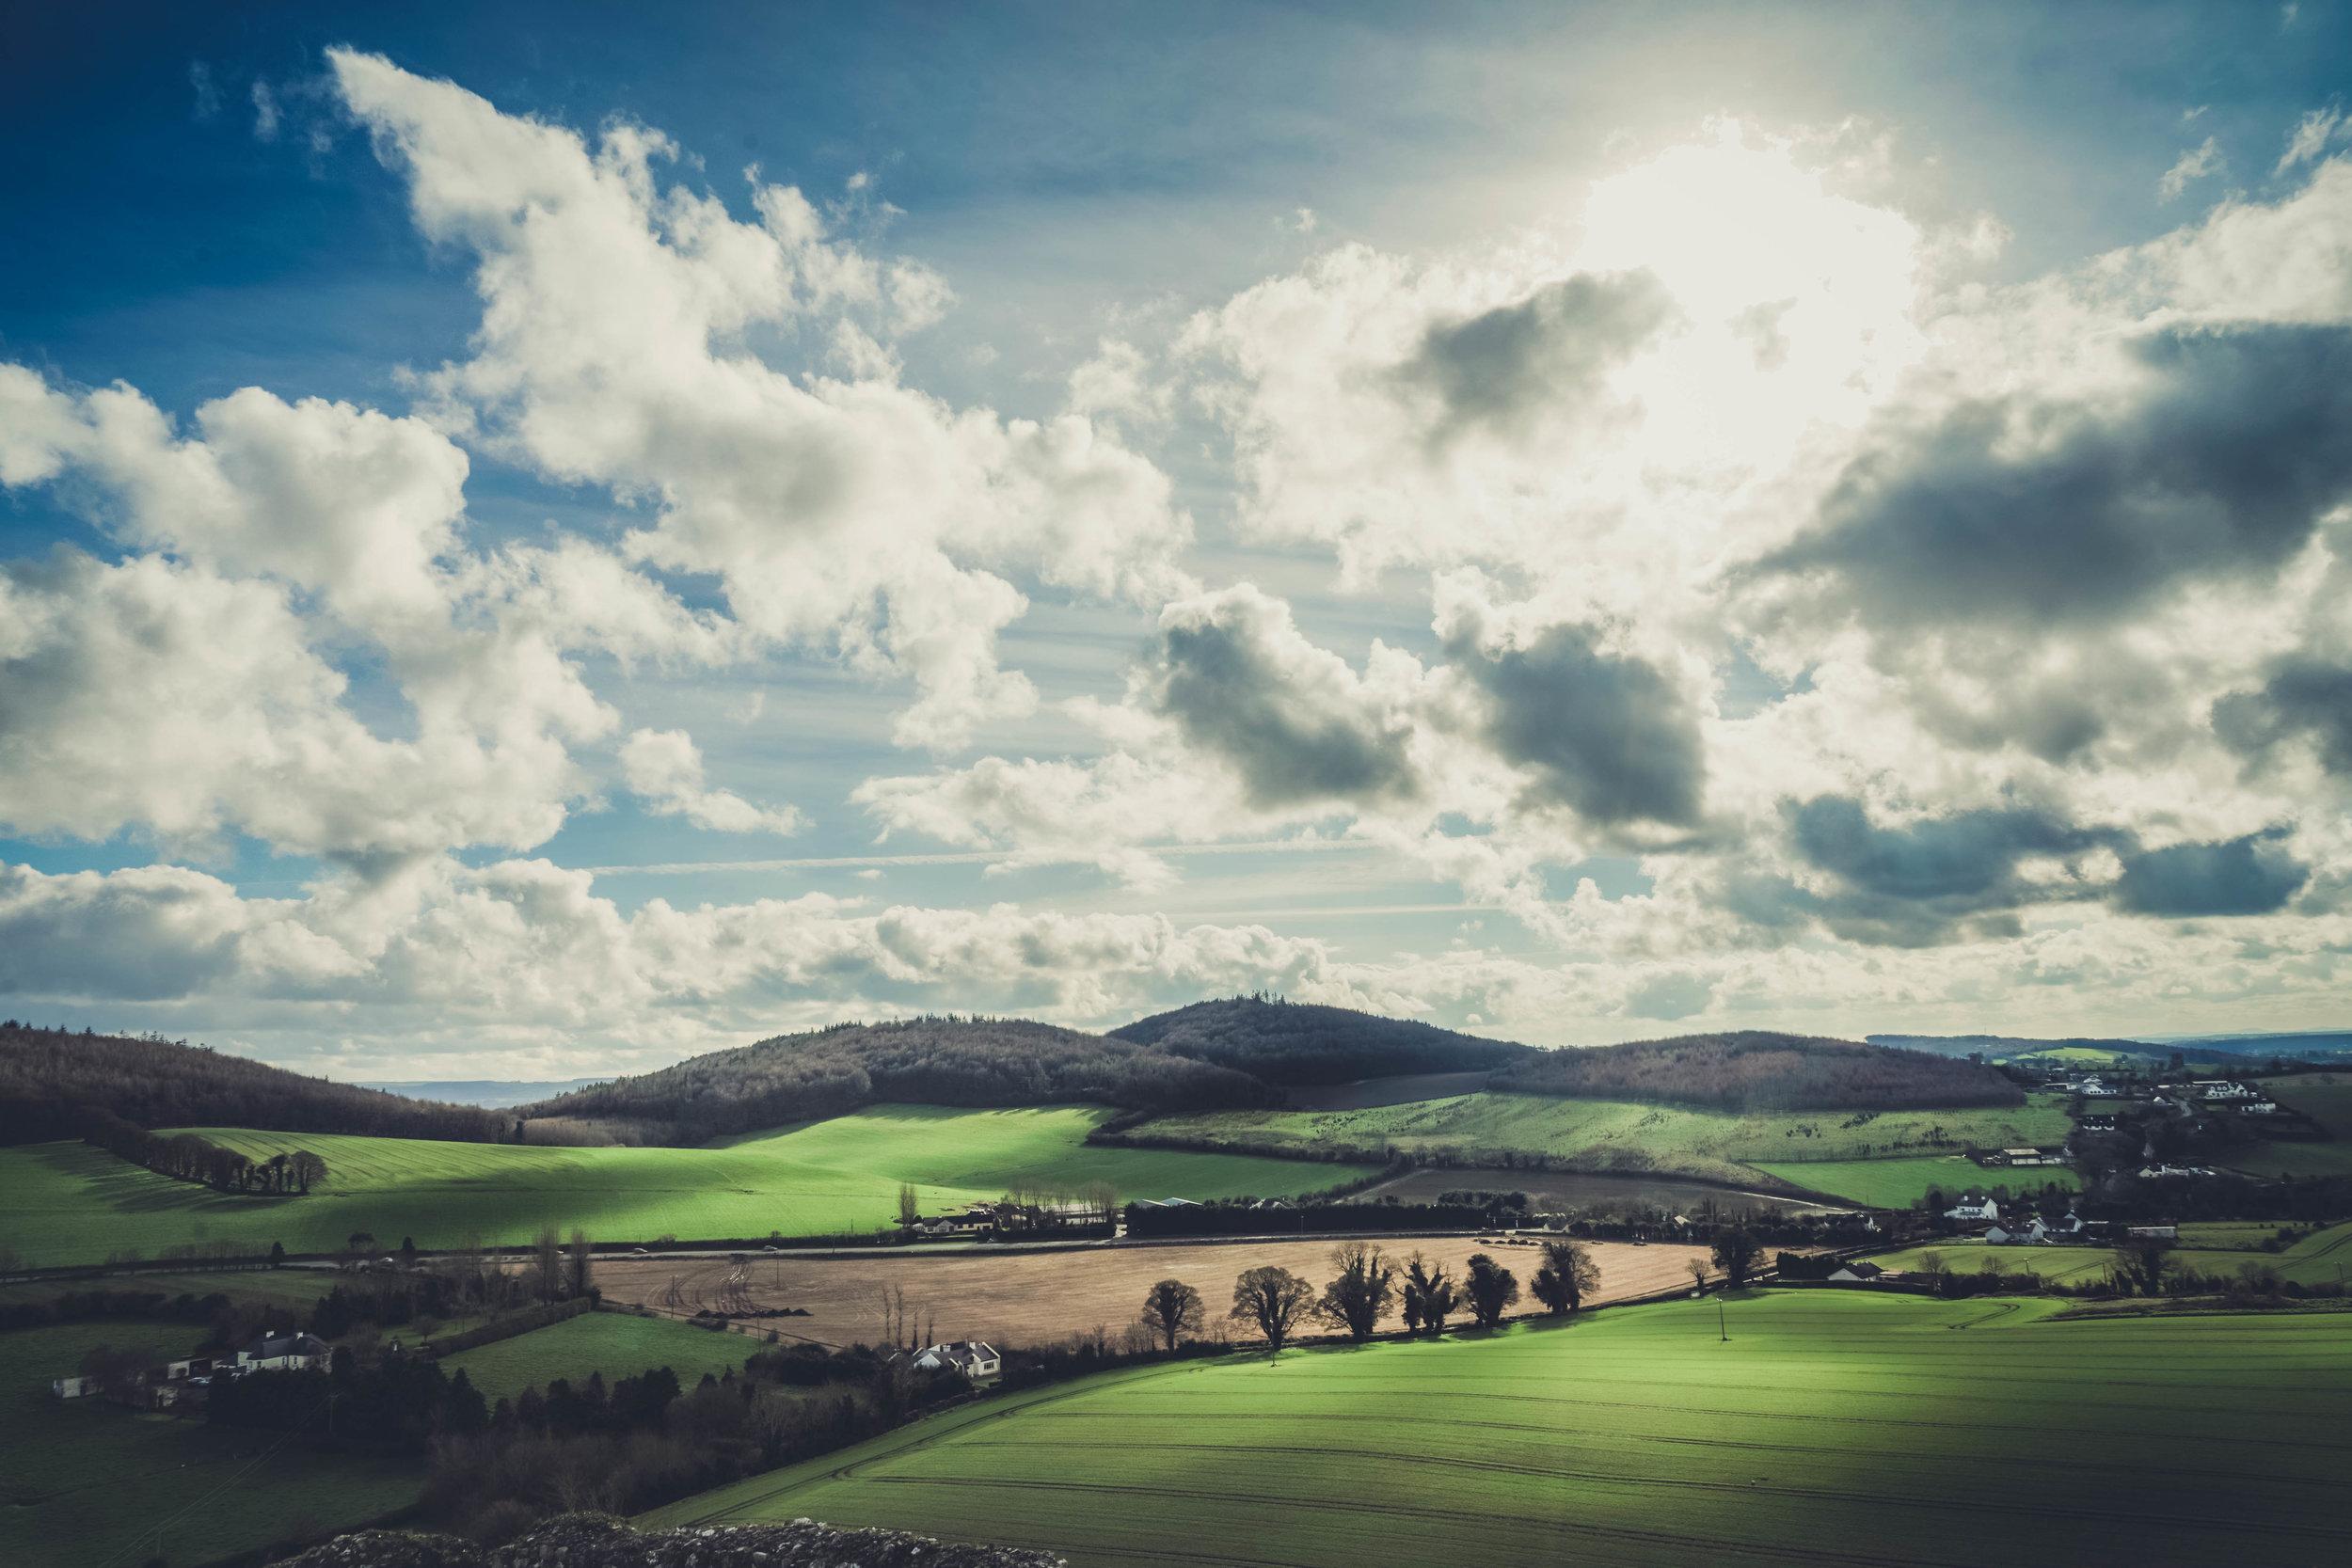 Ireland. Castle. Old castle. irish history. history. Rock of Dunamase. blue sky. rock. pathway. adventure. travel. irish counrty. green fields. sunlight.jpg